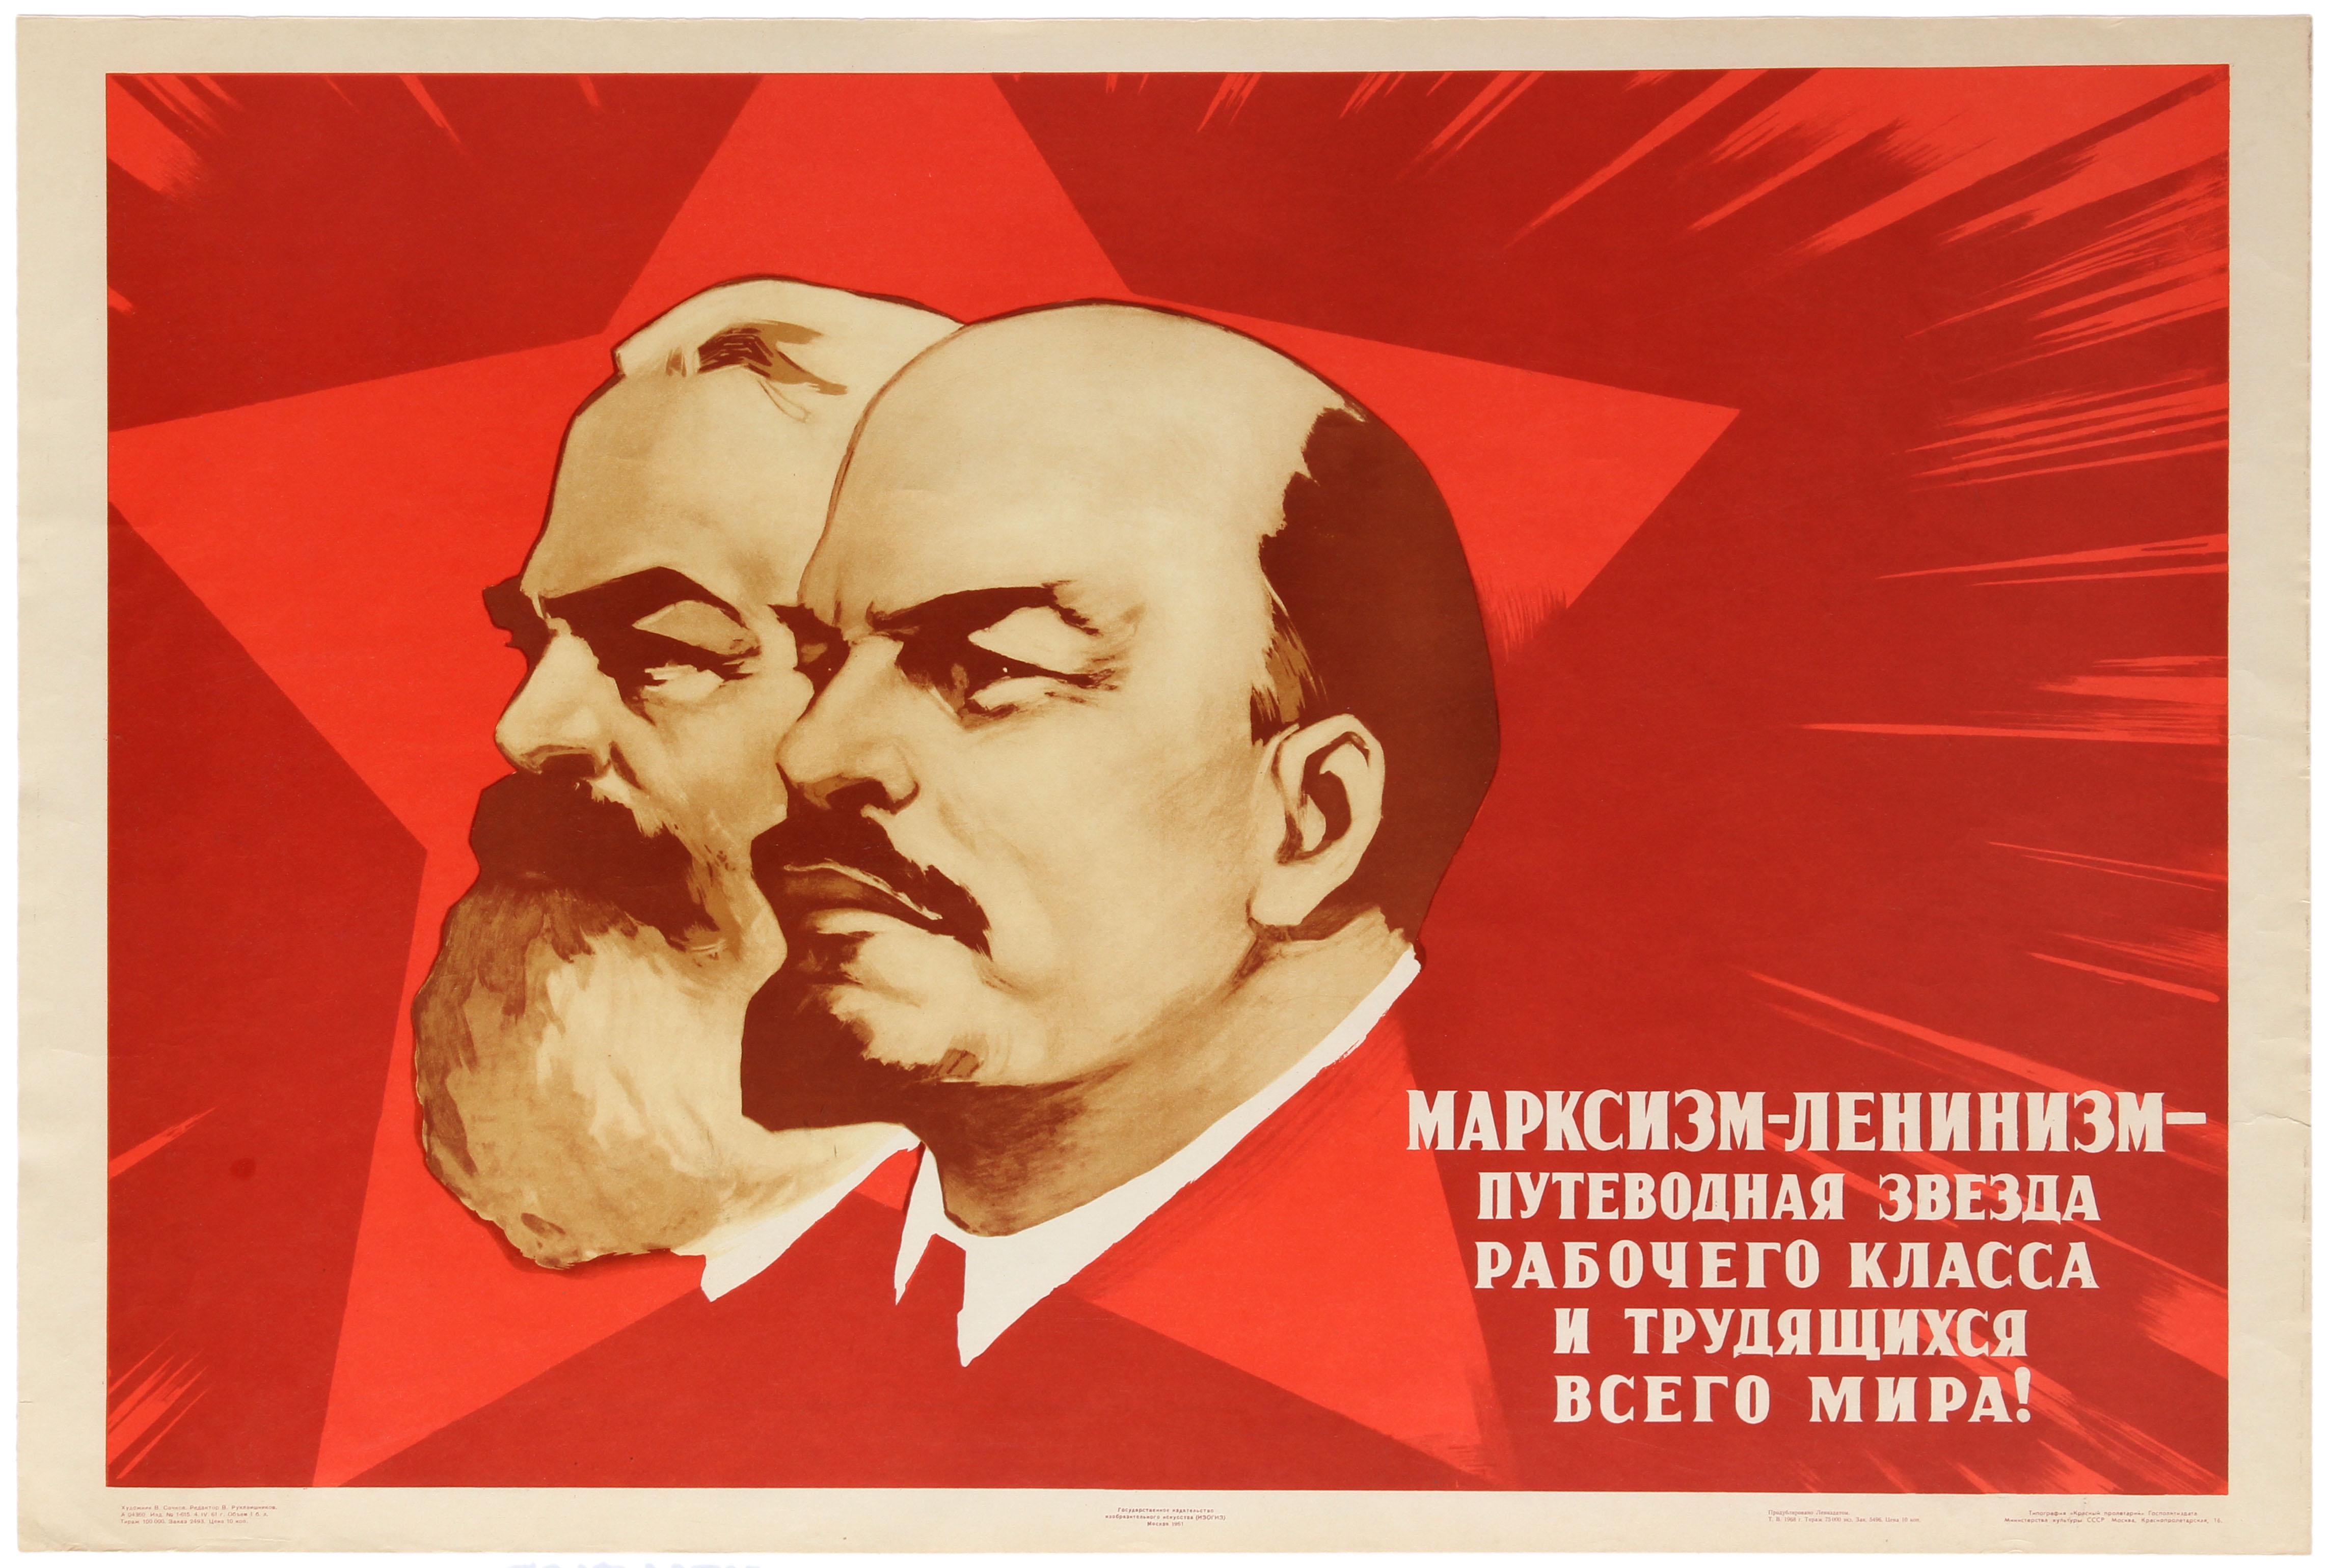 Lot 35 - Propaganda Poster Marxism Leninism Soviet Union USSR